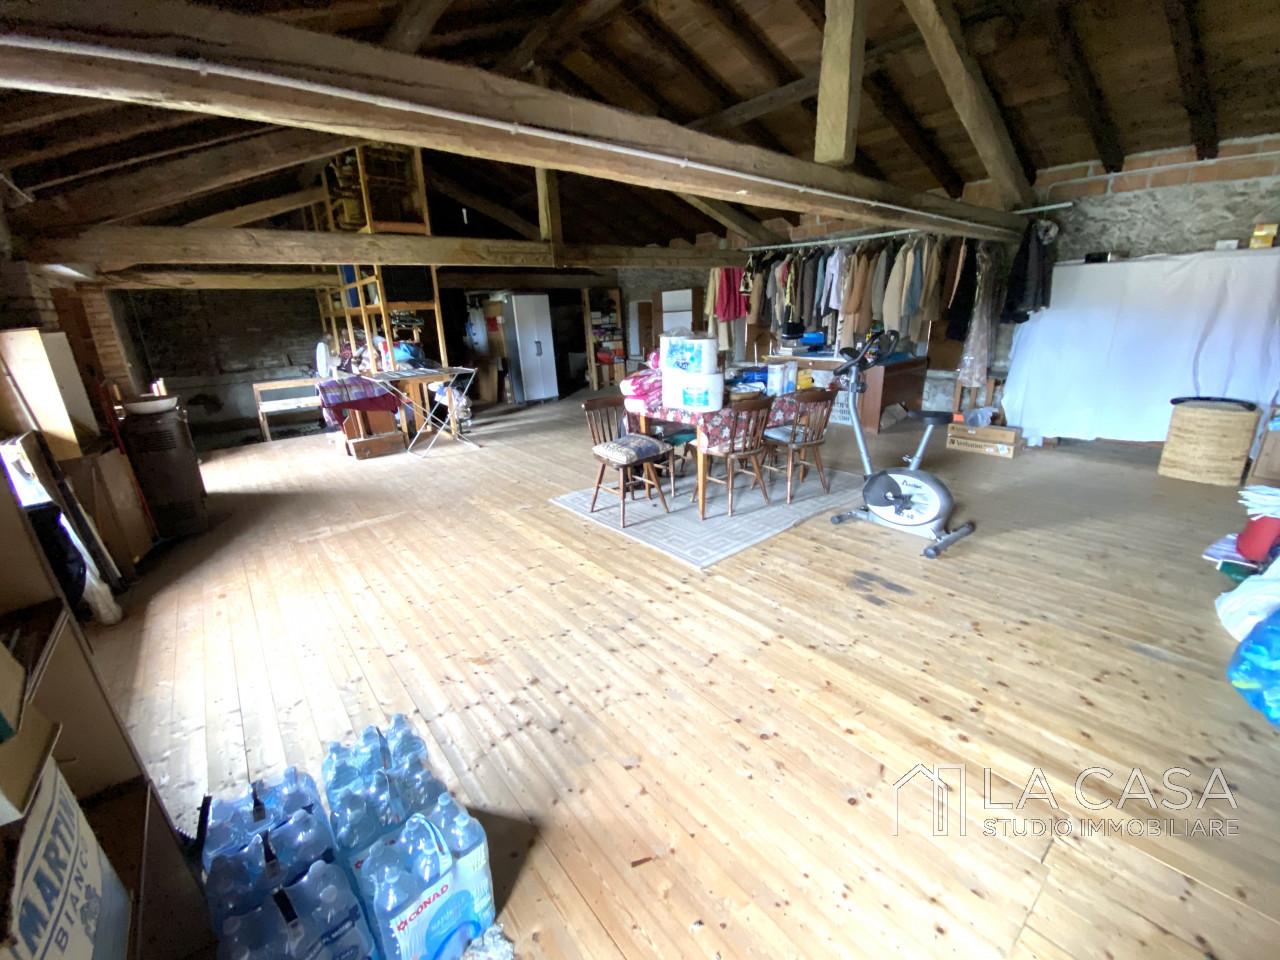 Palazzo plurifamiliare in vendita a Valvasone Arzene - Rif. P3 https://images.gestionaleimmobiliare.it/foto/annunci/200827/2284141/1280x1280/021__img_3731_wmk_0.jpg